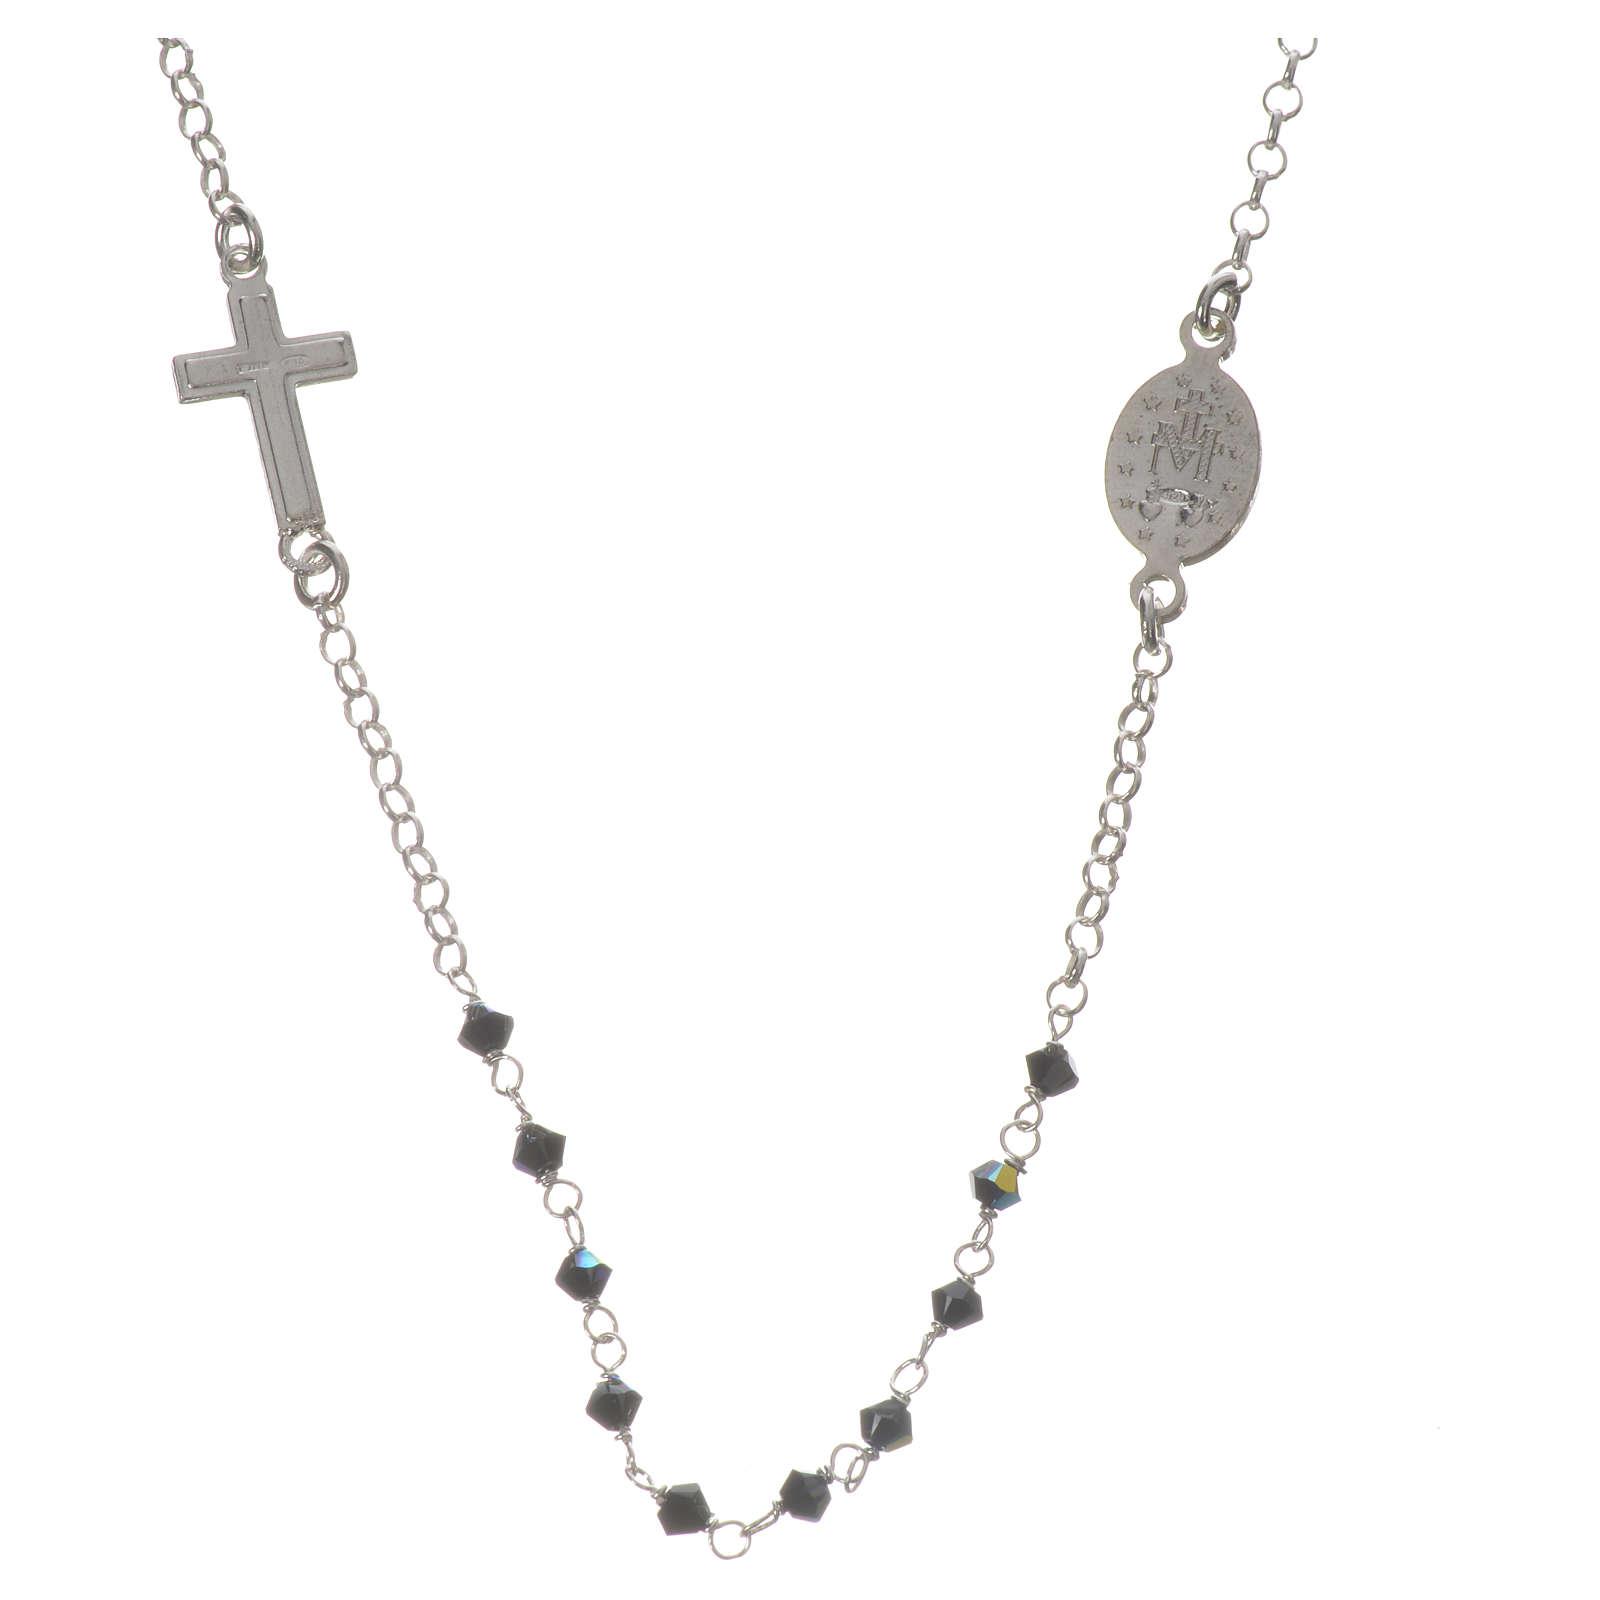 Collar Plata 925 y Swarovski negro Milagrosa 3 mm 4